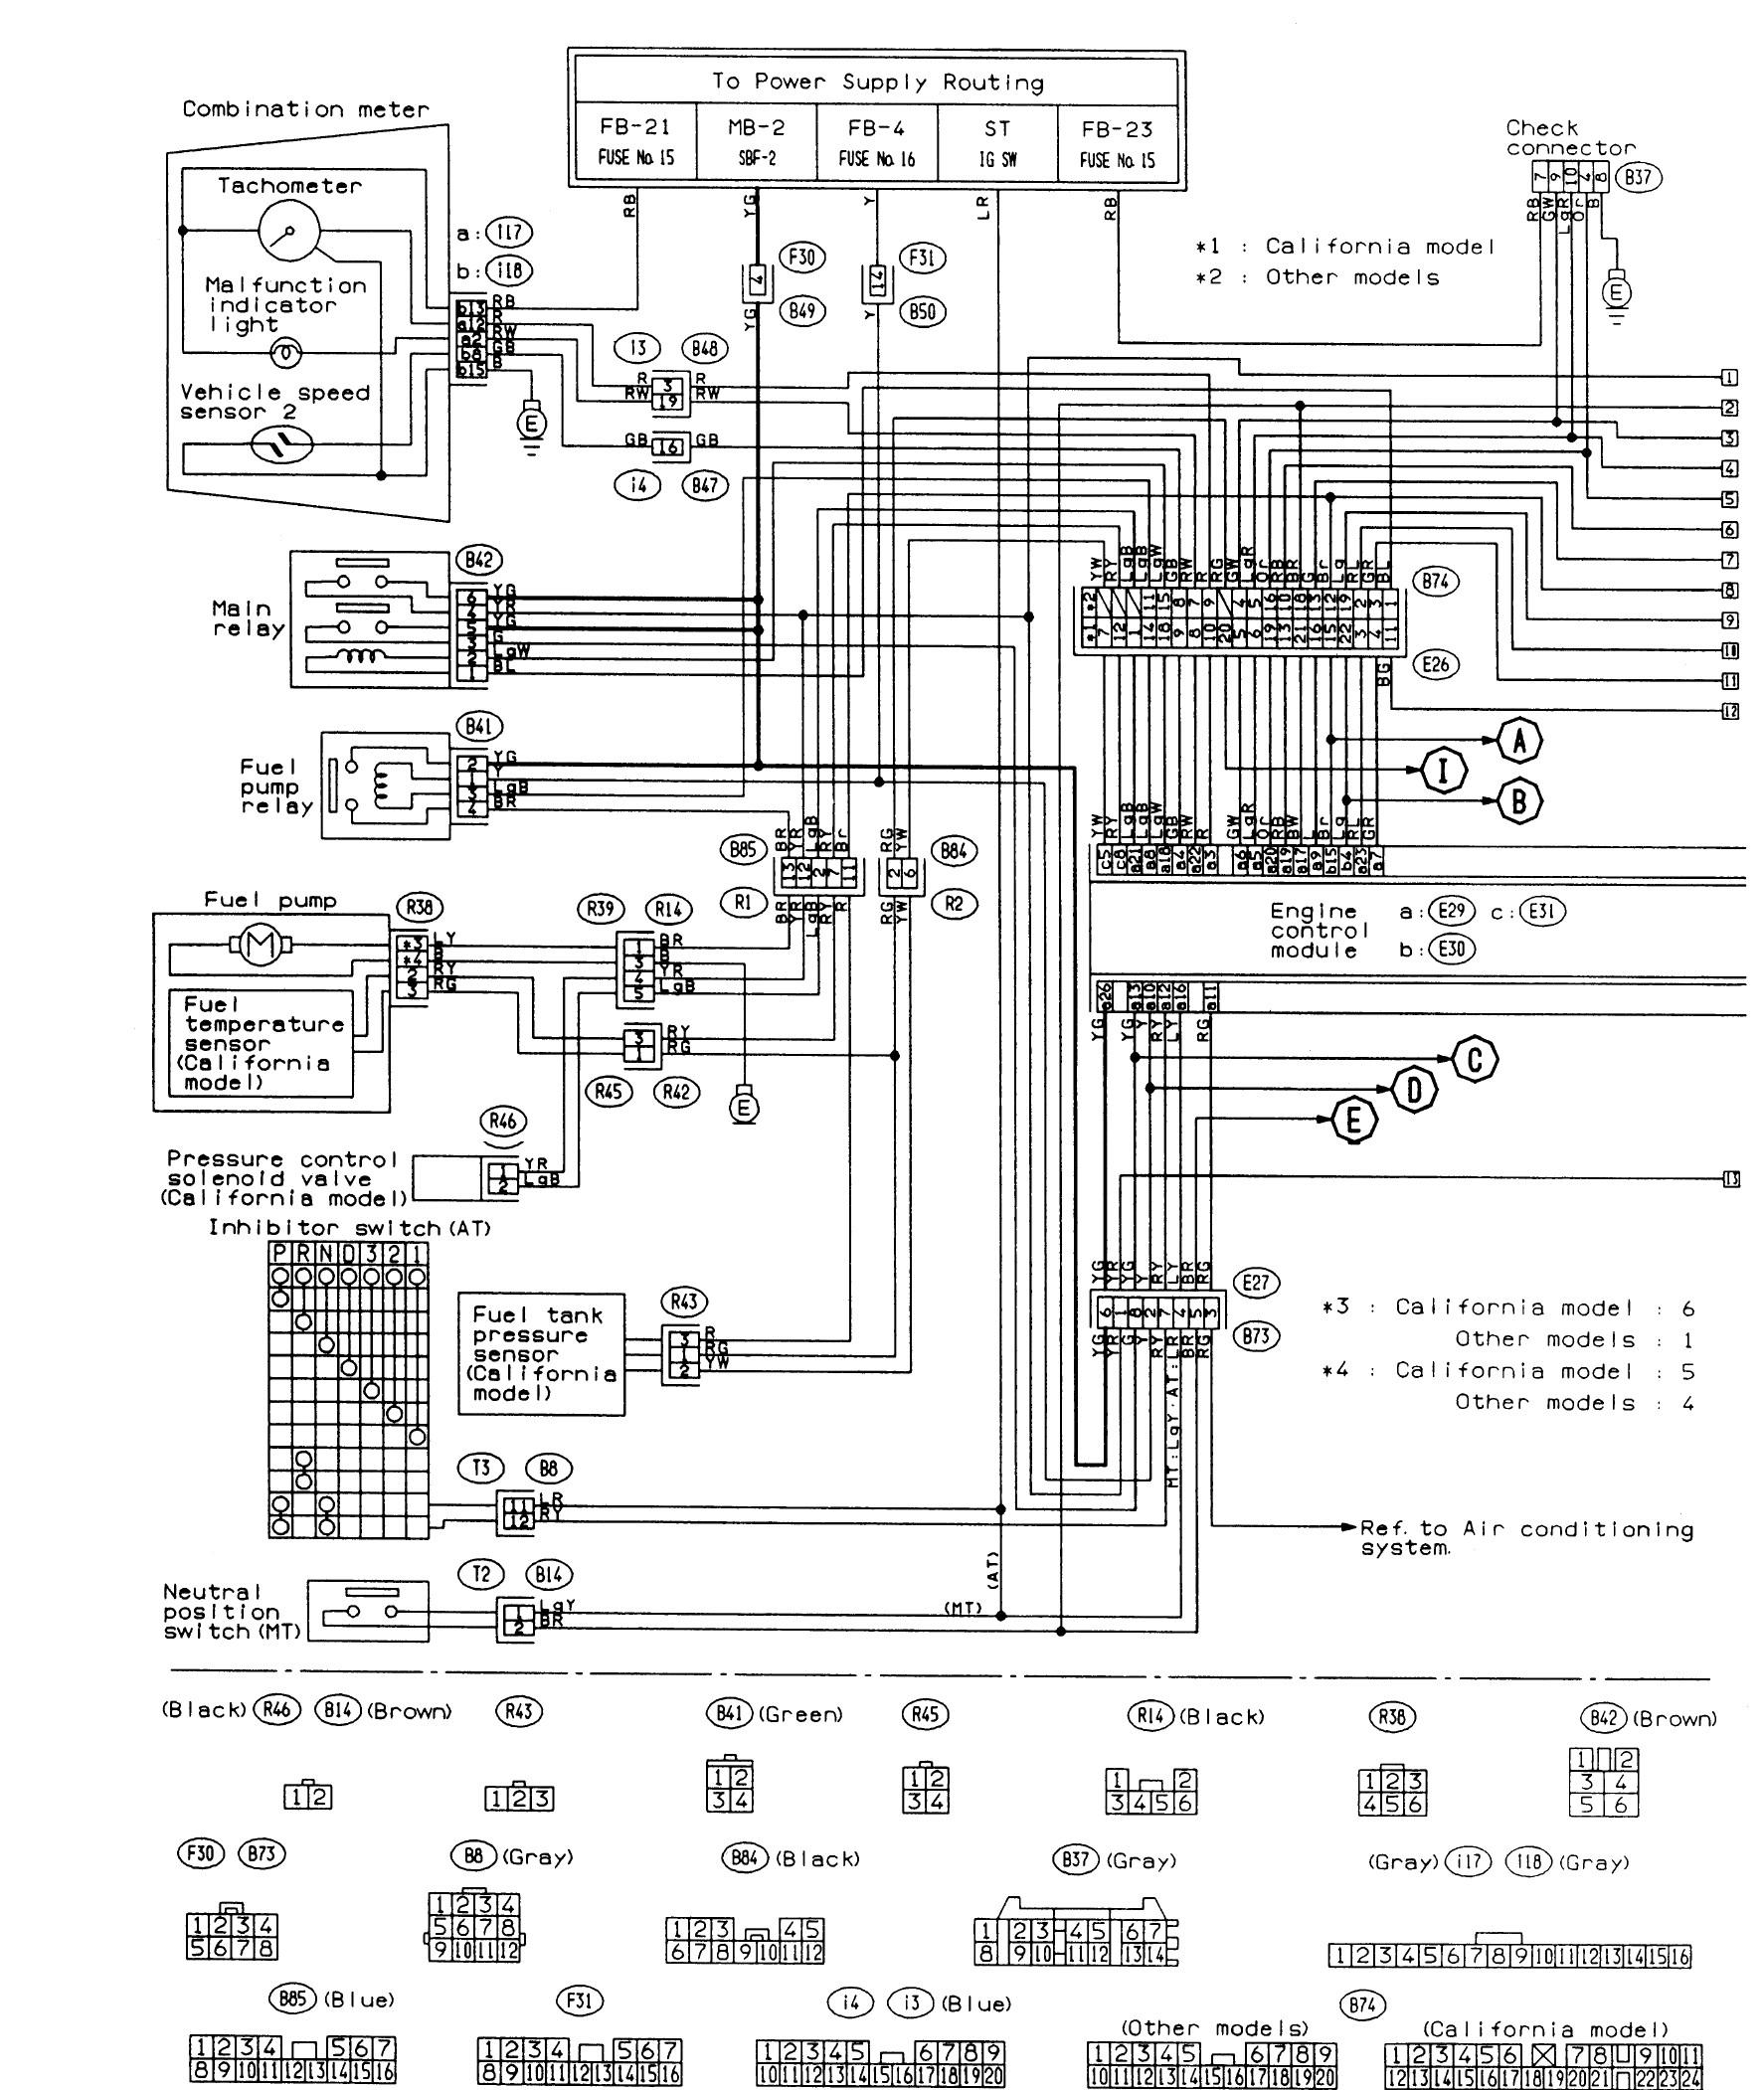 Subaru Legacy Engine Diagram 2 Wiring Diagram for 1997 Subaru Legacy 96 Subaru Legacy Outback Of Subaru Legacy Engine Diagram 2